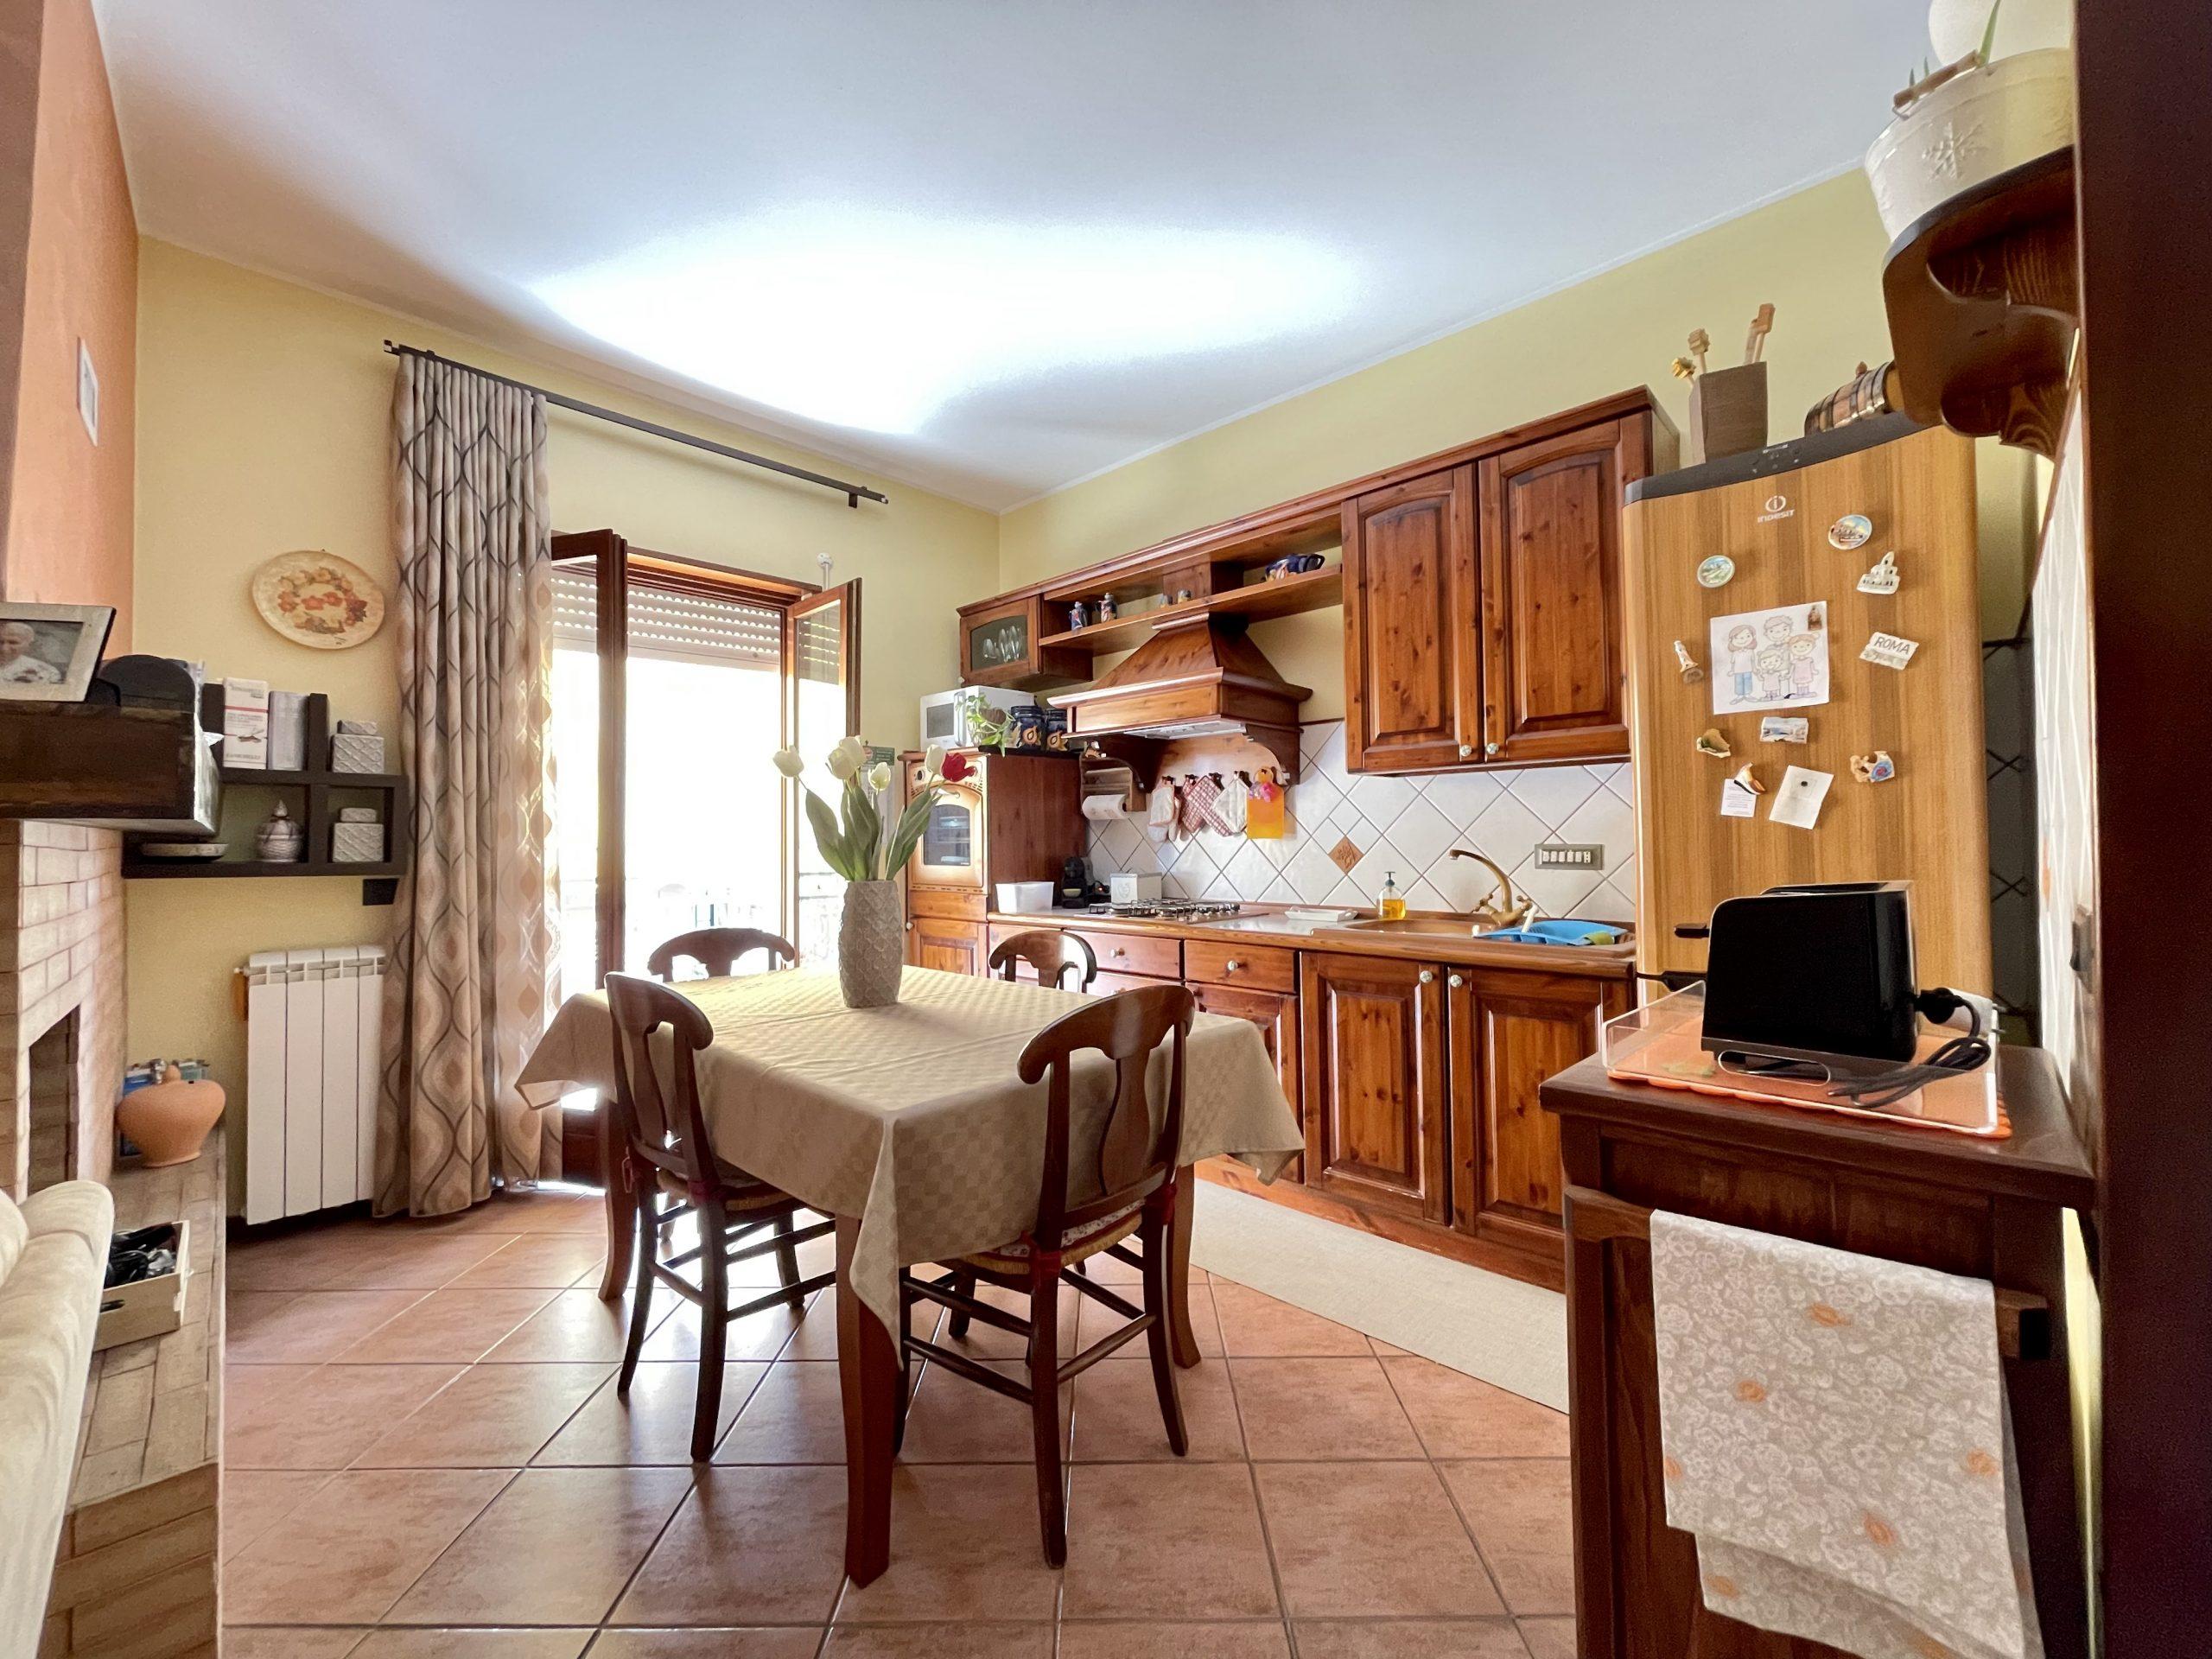 Appartamento a Partinico, Via Baldassare Sgroi